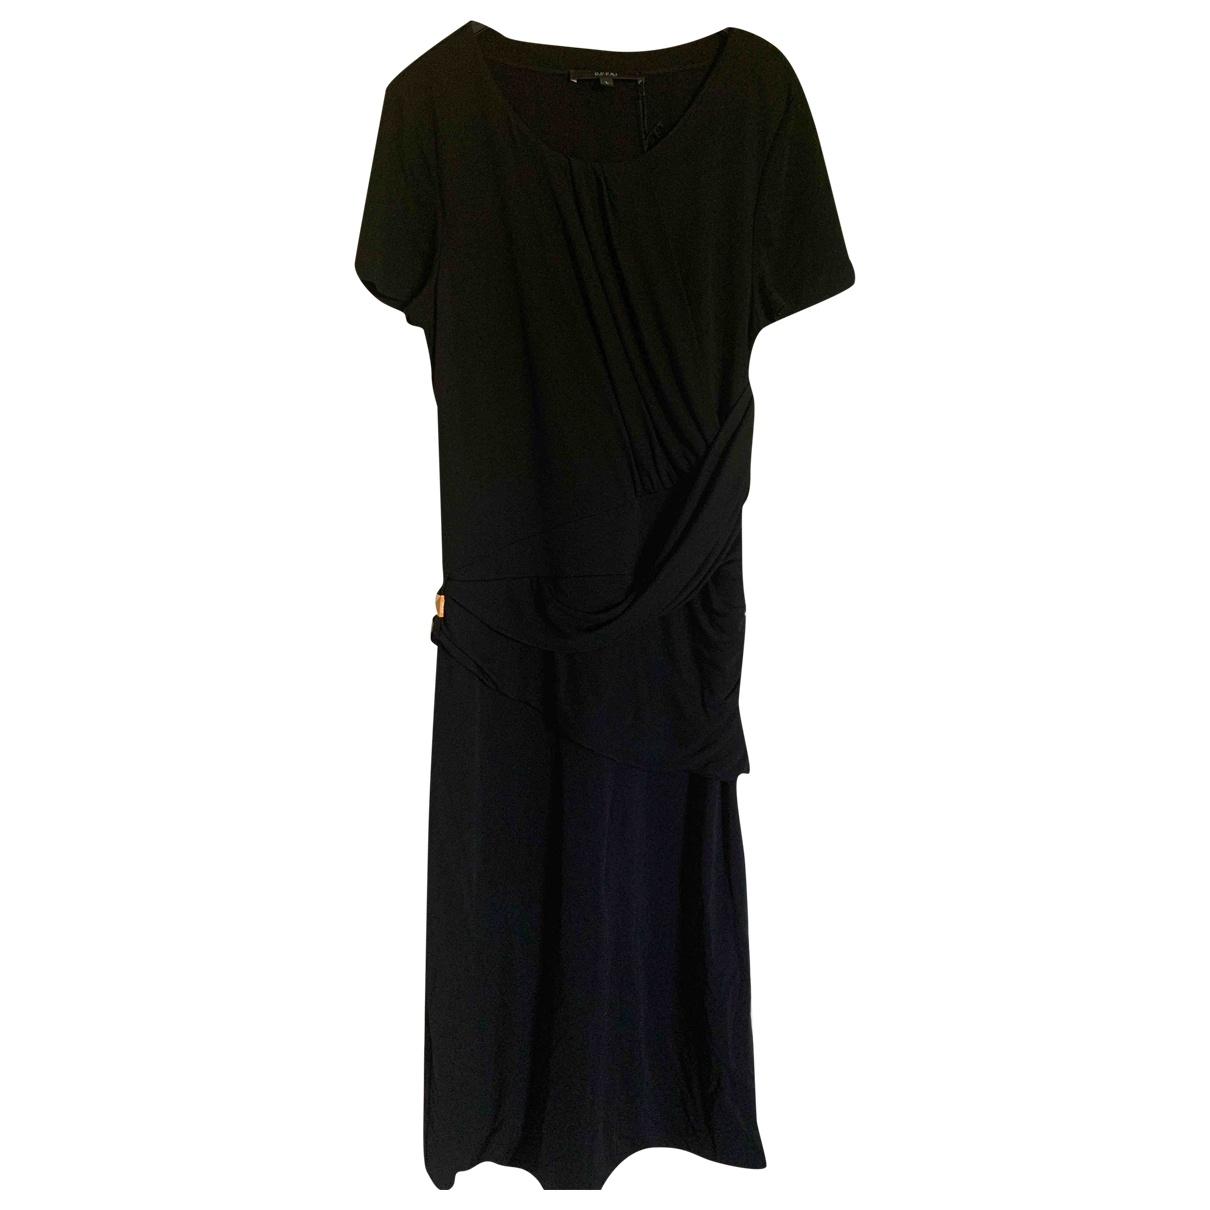 Gucci \N Black dress for Women L International